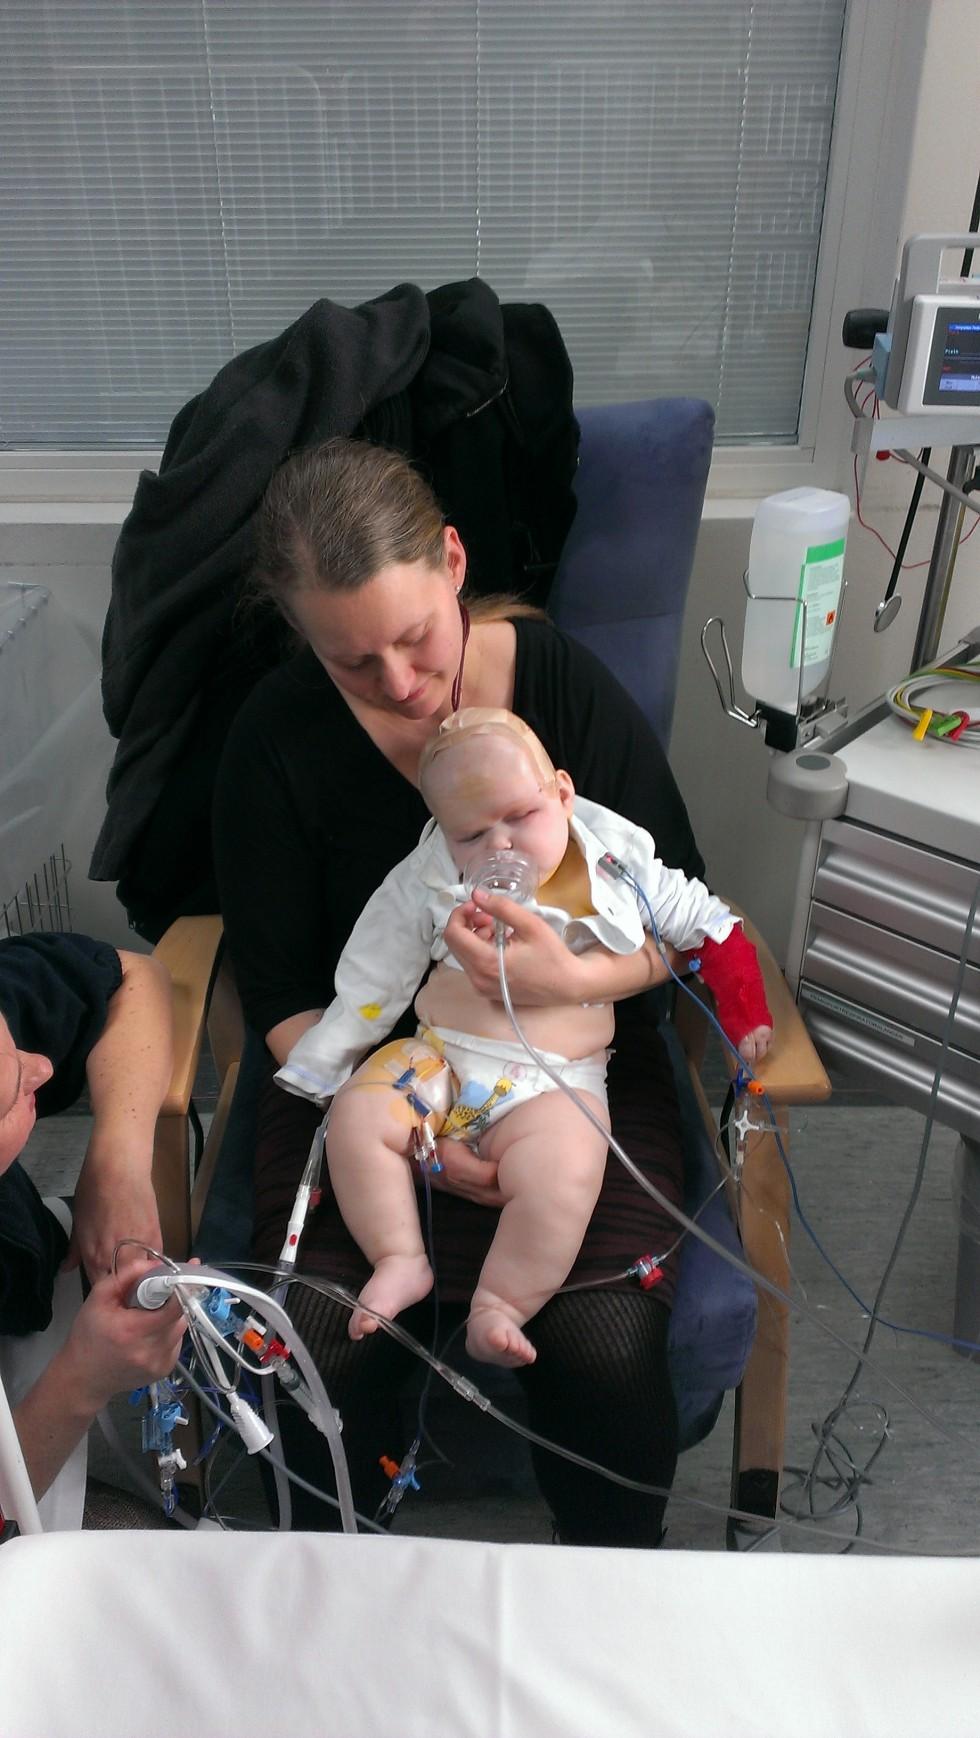 Her er hun lige vågnet op fra operationen!